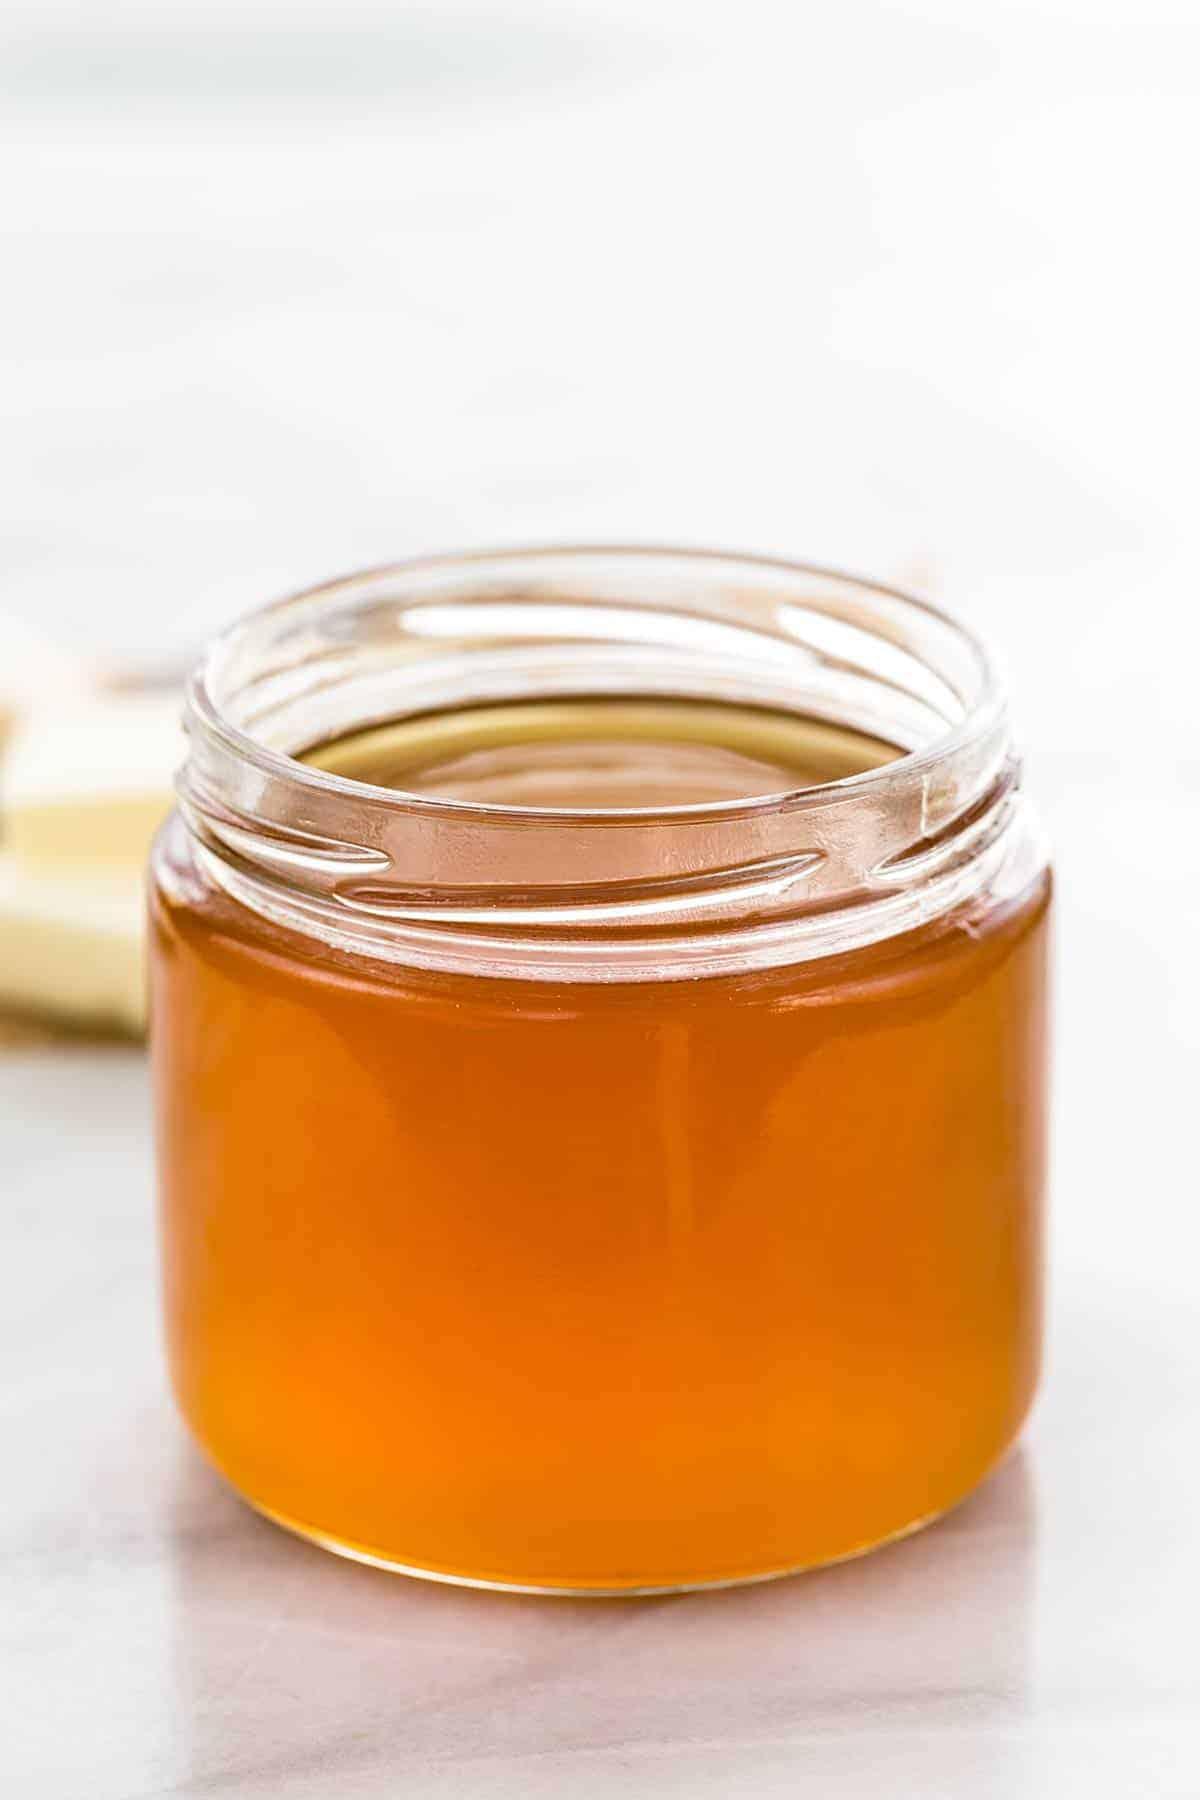 Homemade ghee in a glass jar